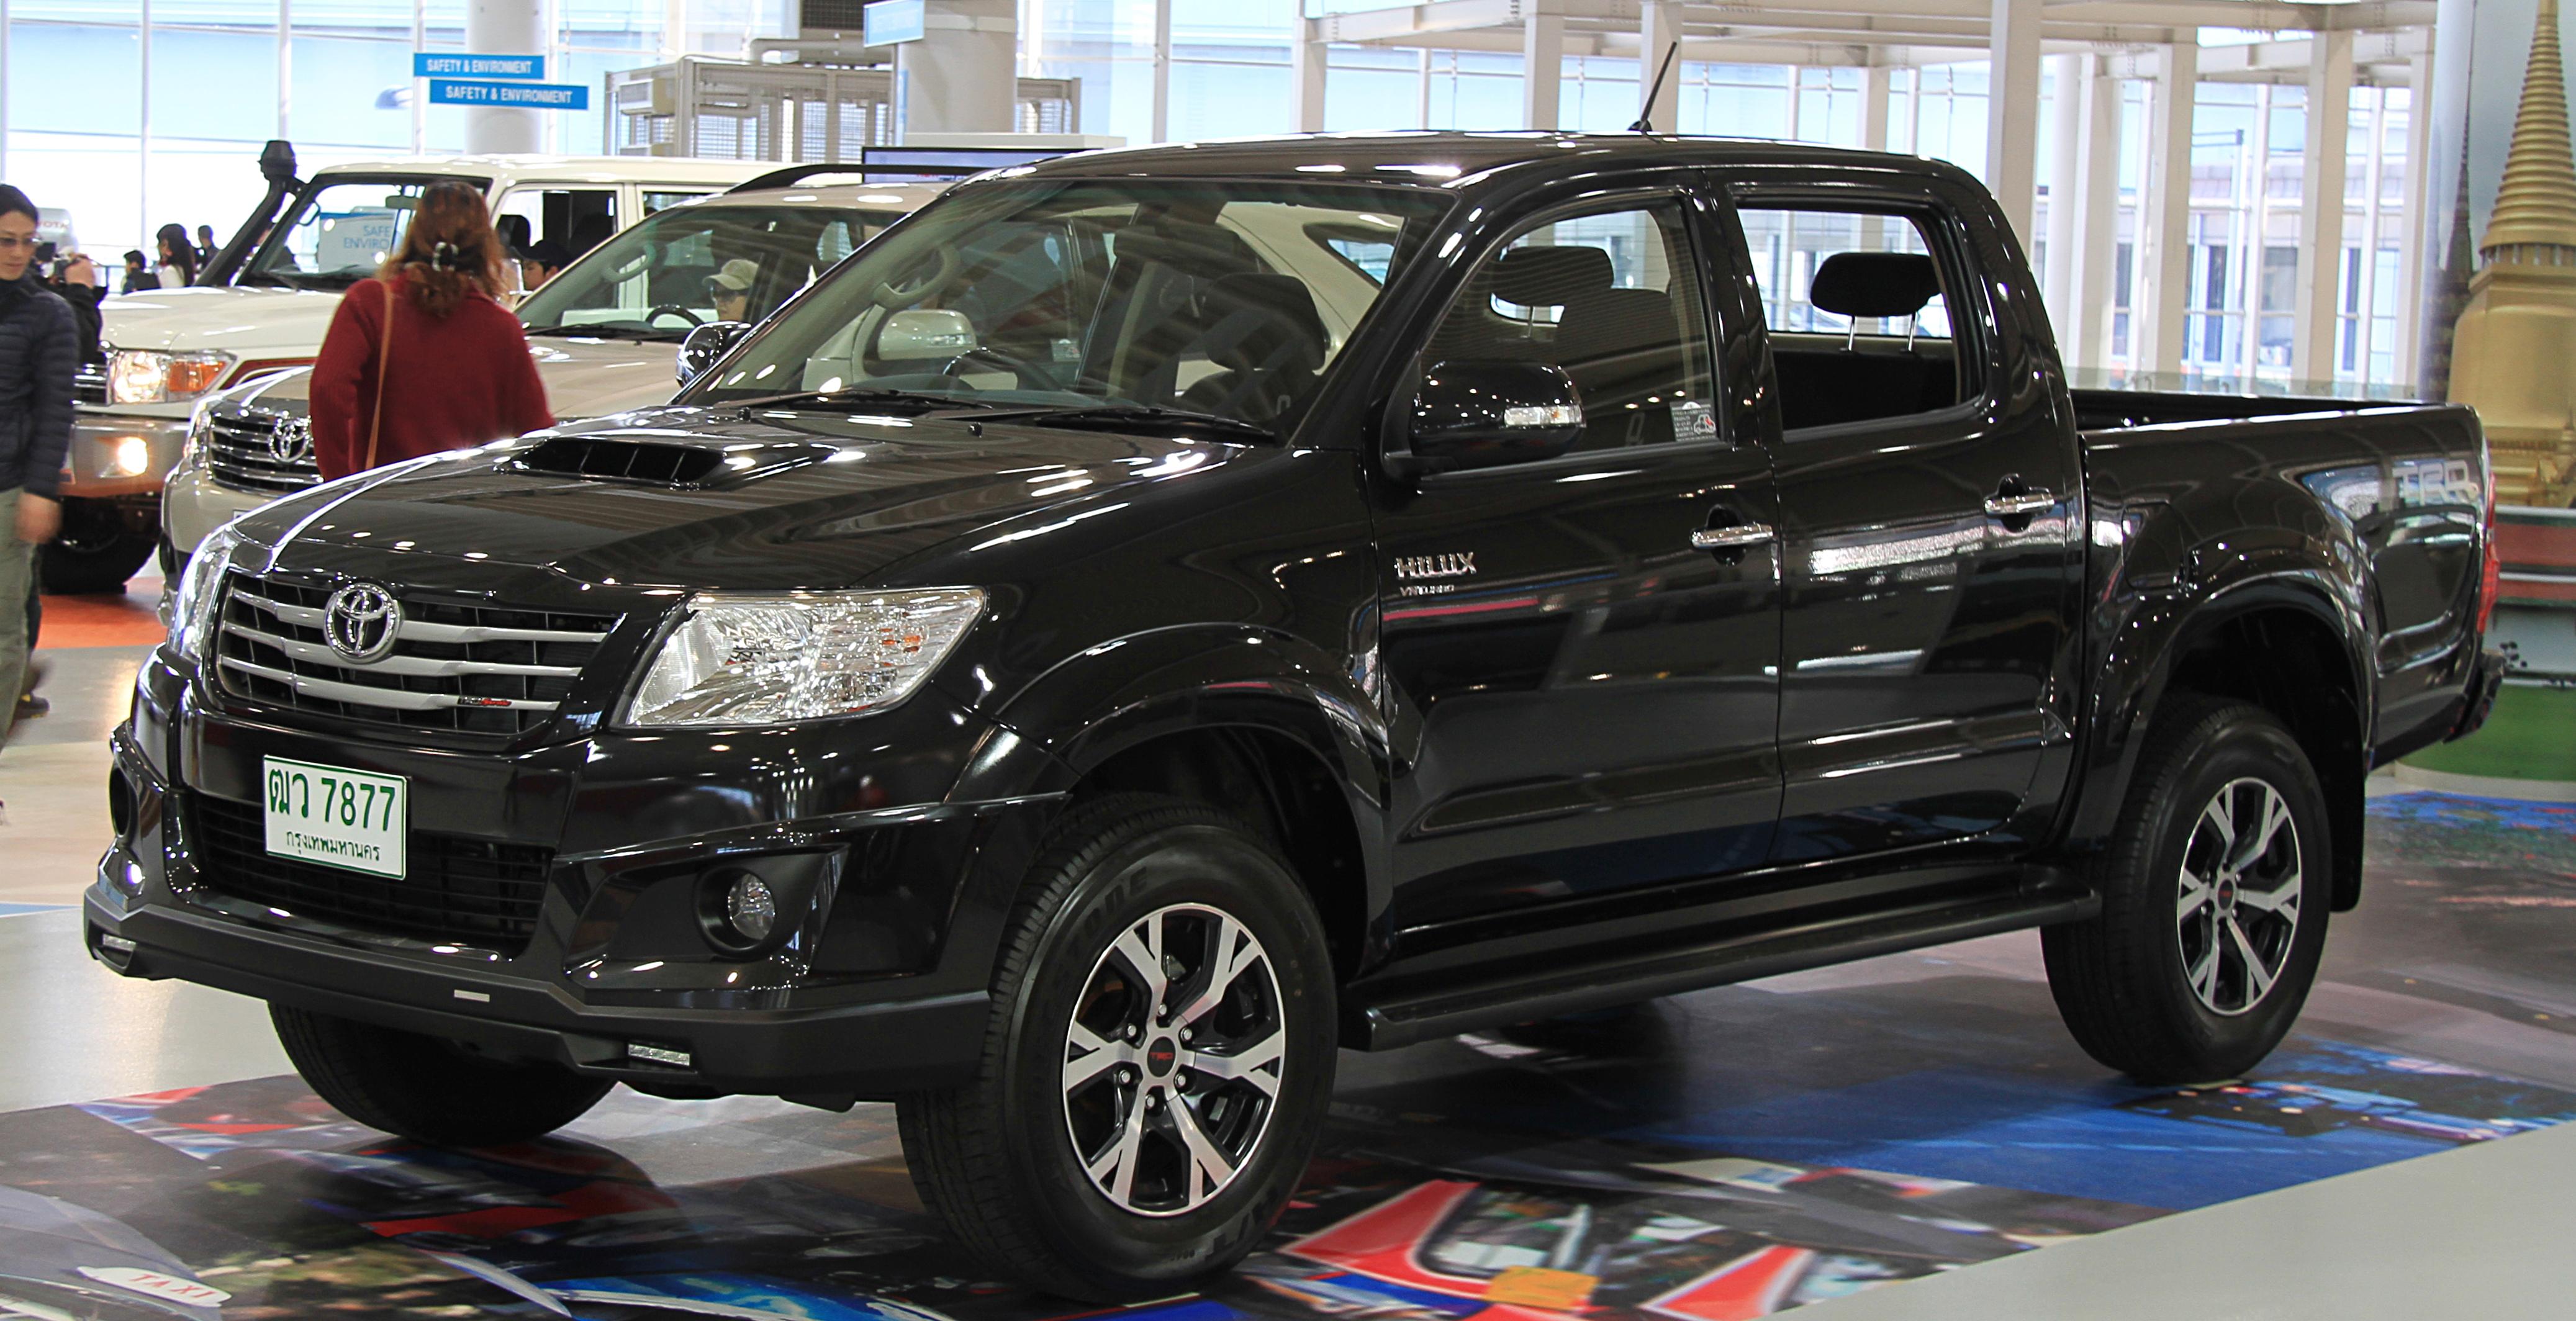 File:Toyota Hilux Vigo Champ TRD.jpg